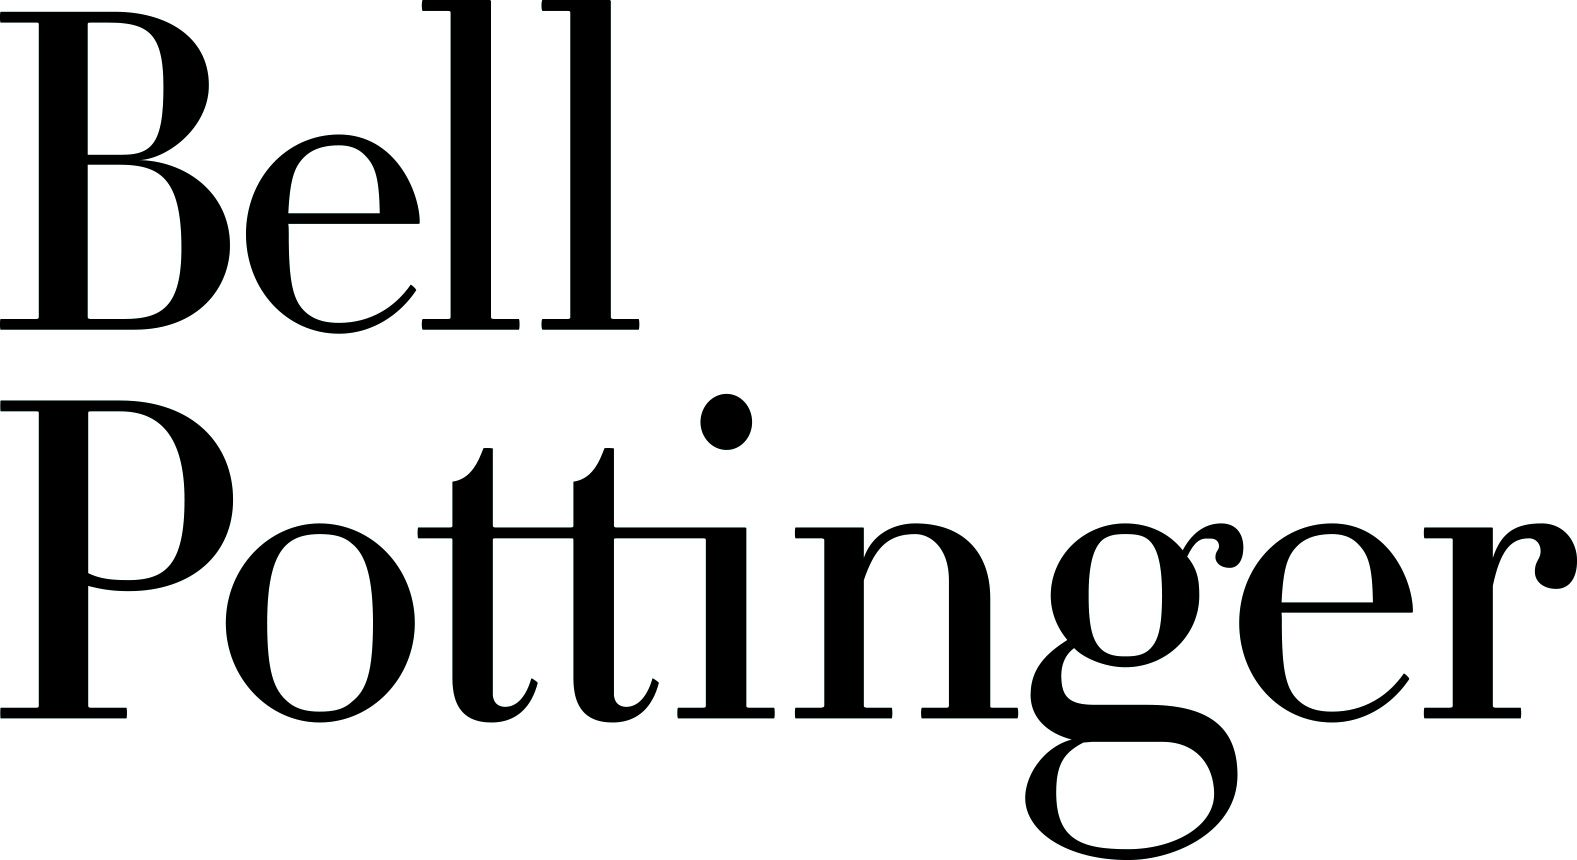 Image result for bellpottinger logo